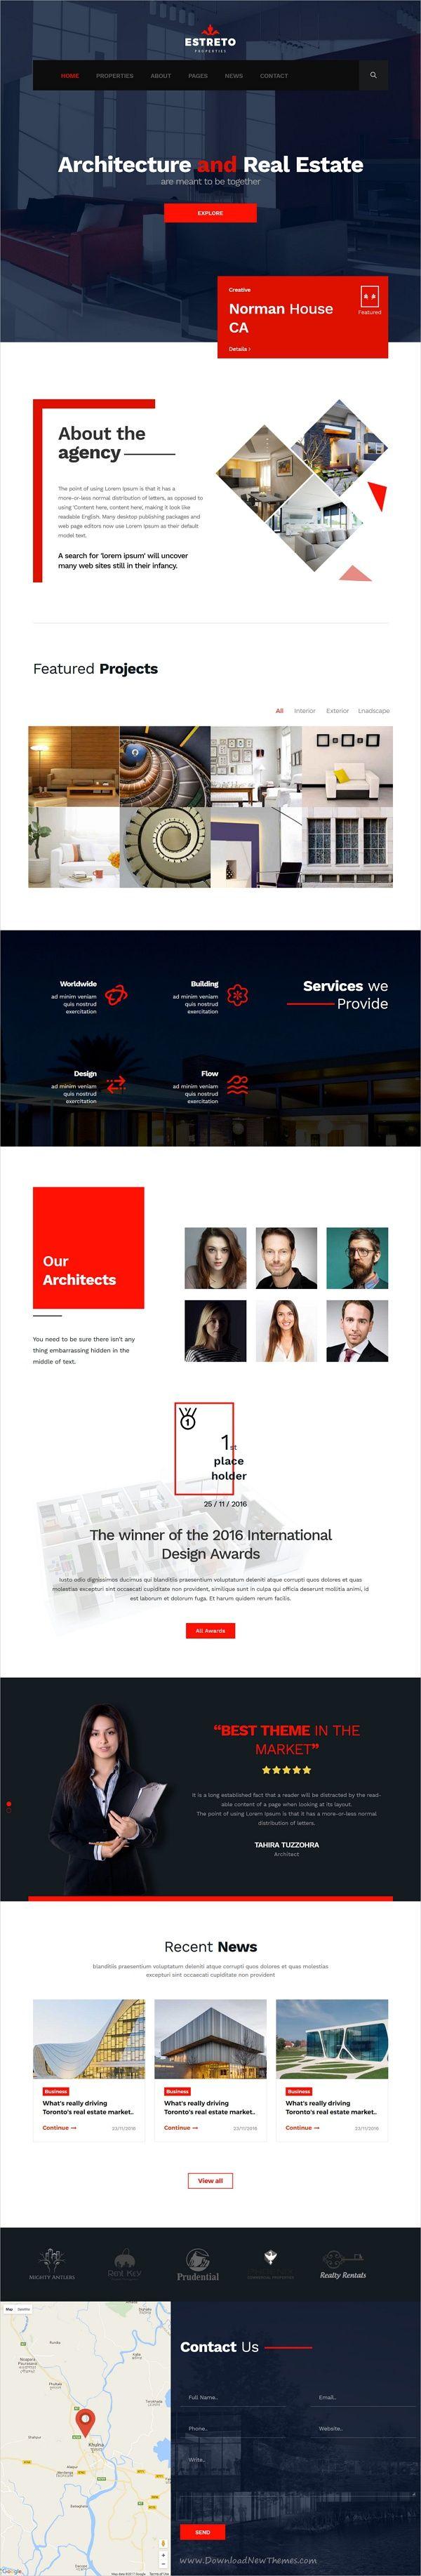 17 Best ideas about Construction Companies on Pinterest ...